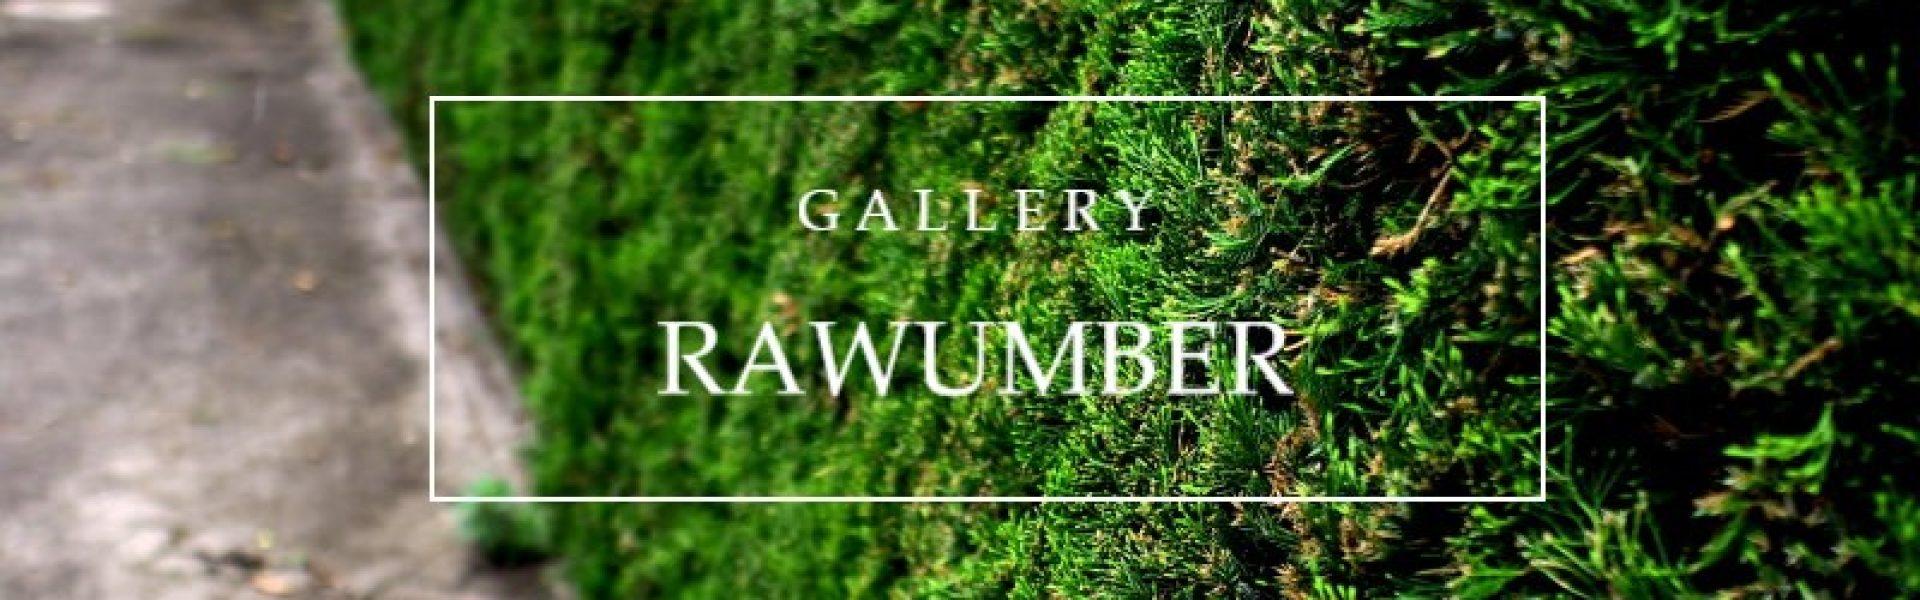 GALLERY-RAWUMBER